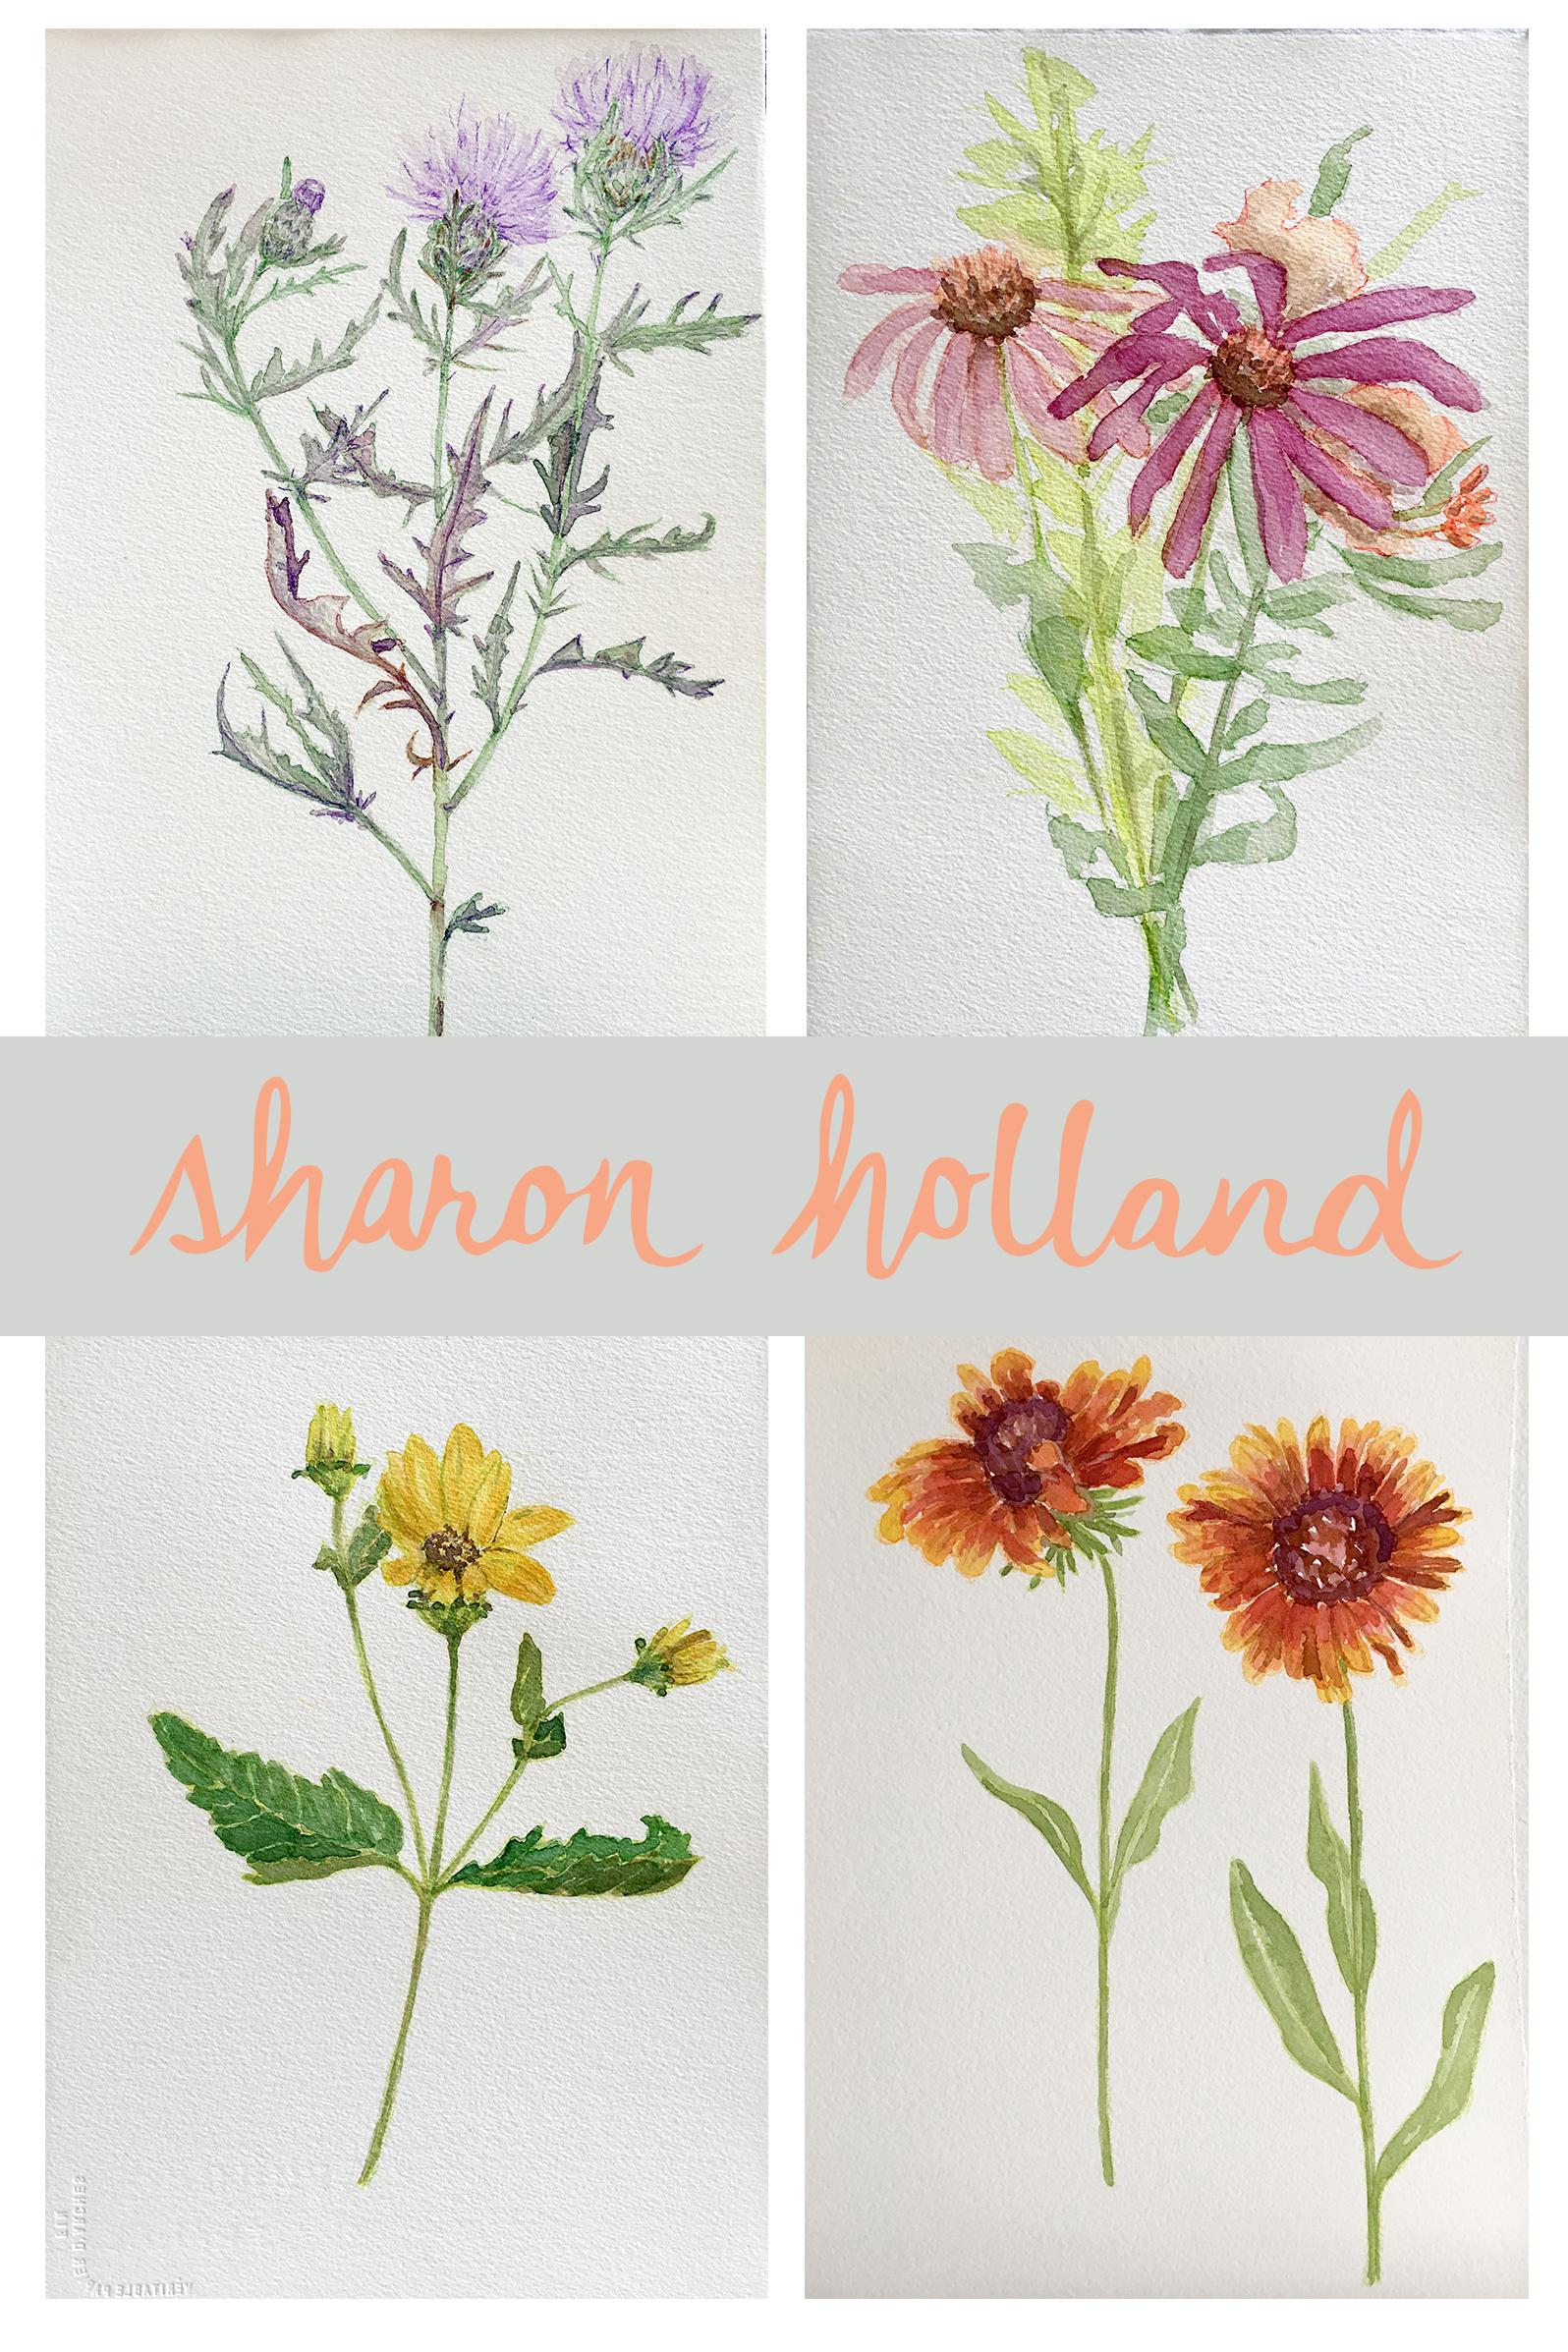 Sharon Holland Art